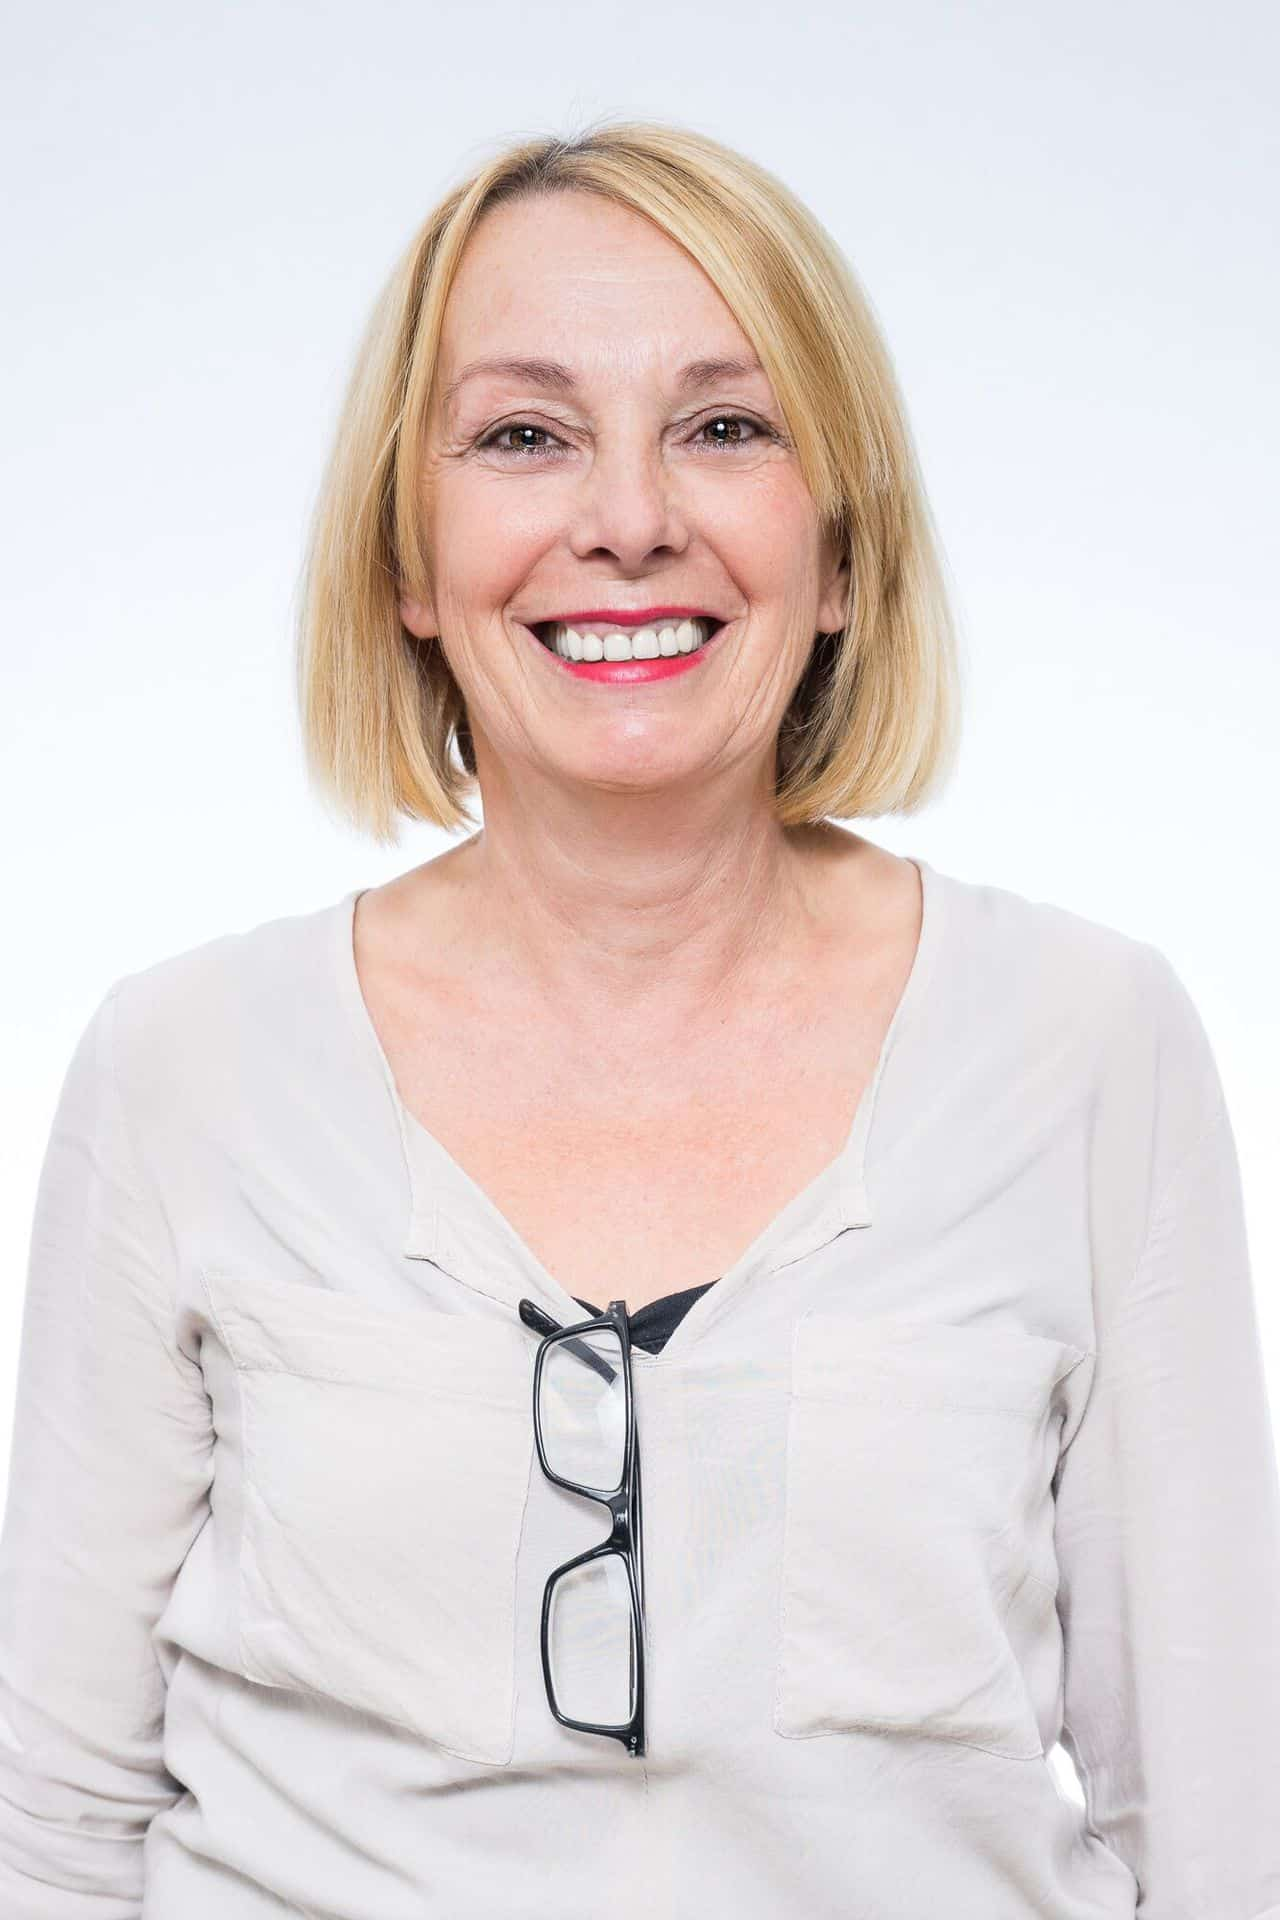 Johanna Danksagmüller